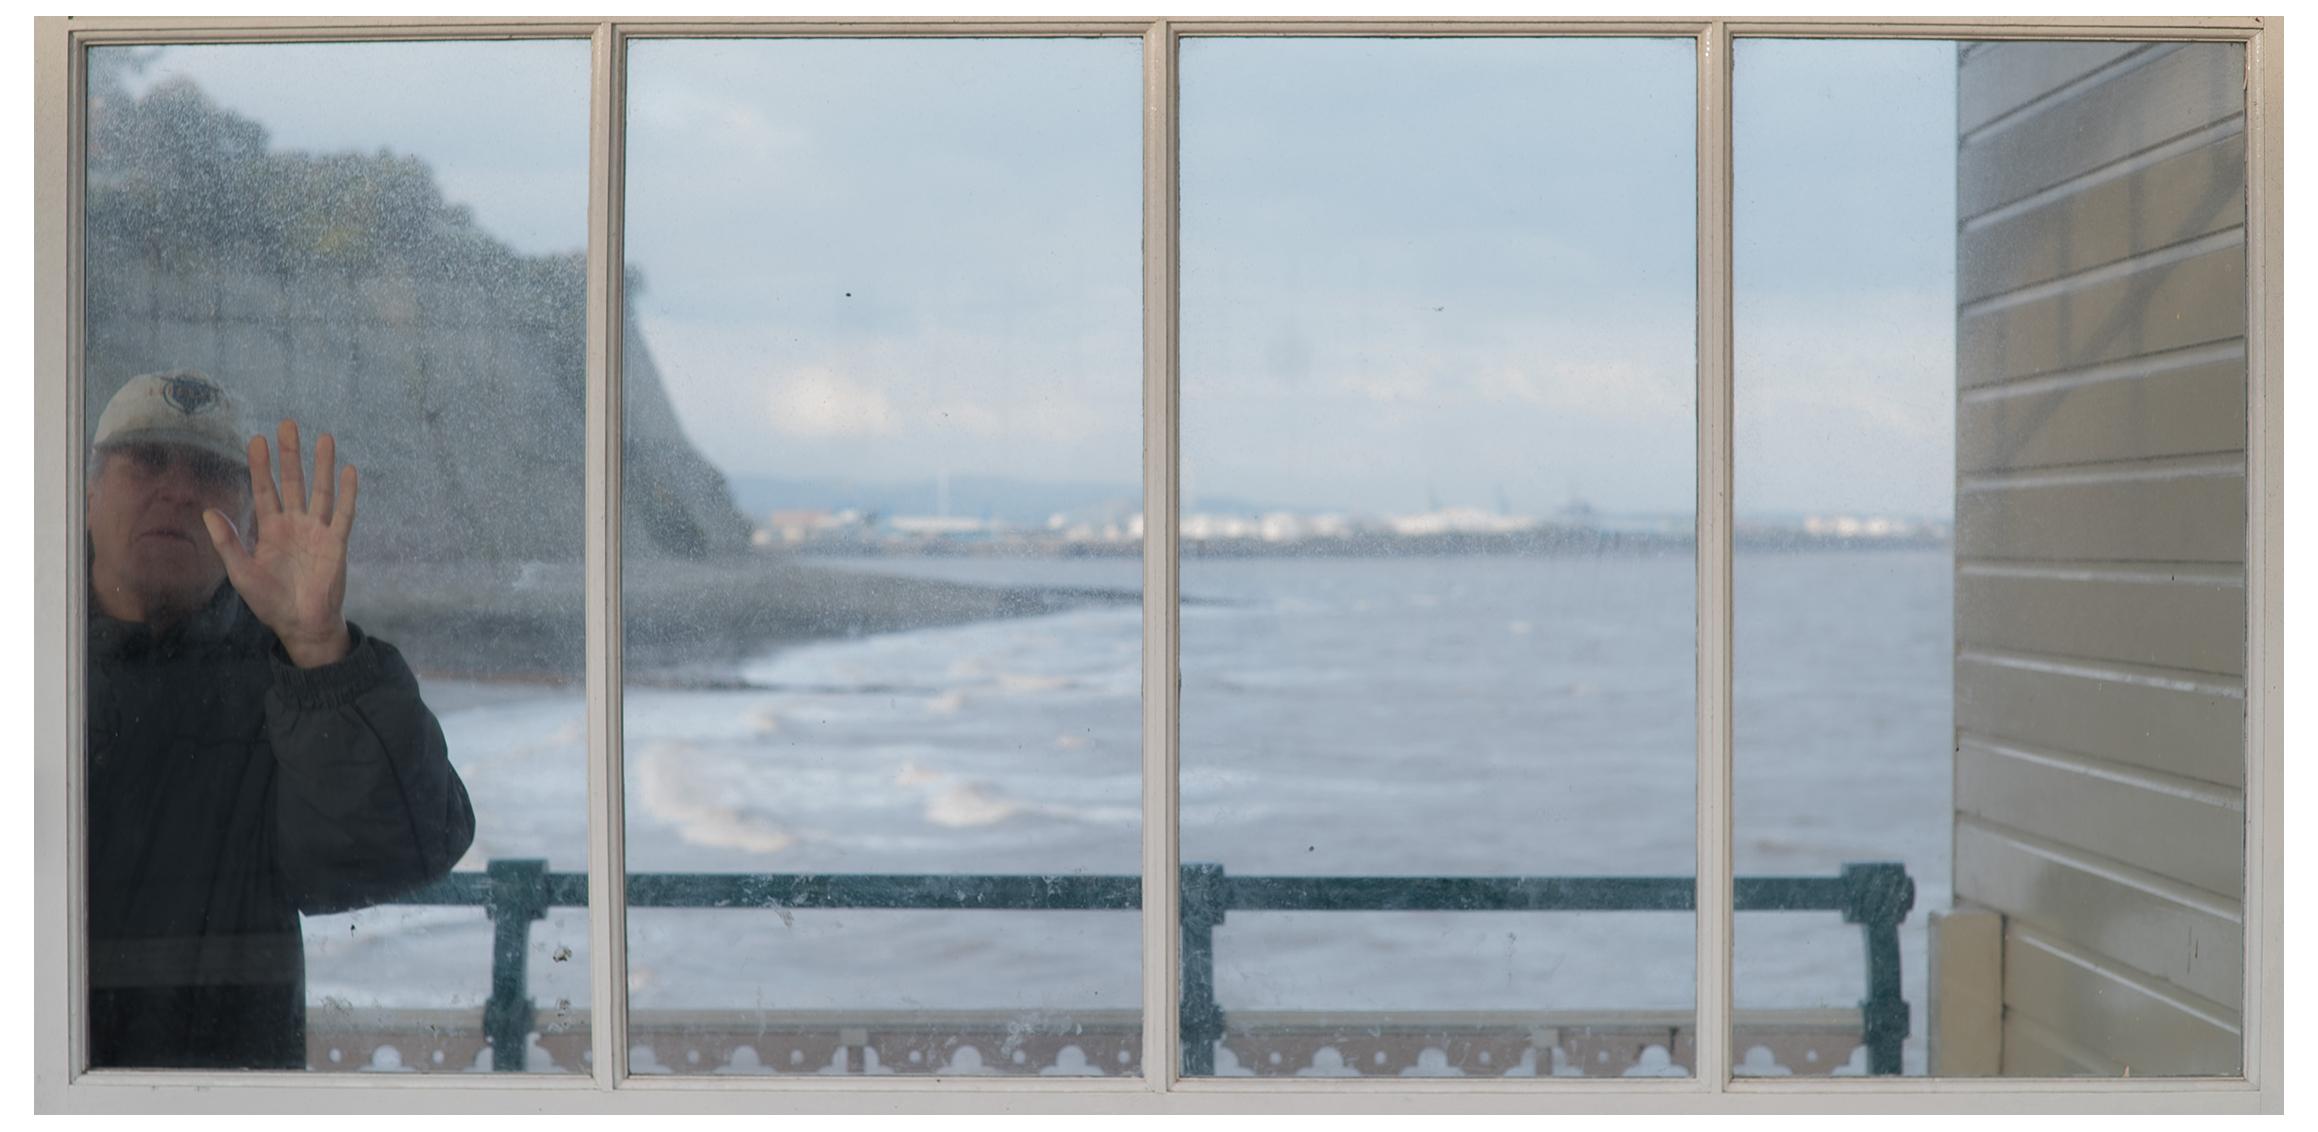 Baz and window.jpg